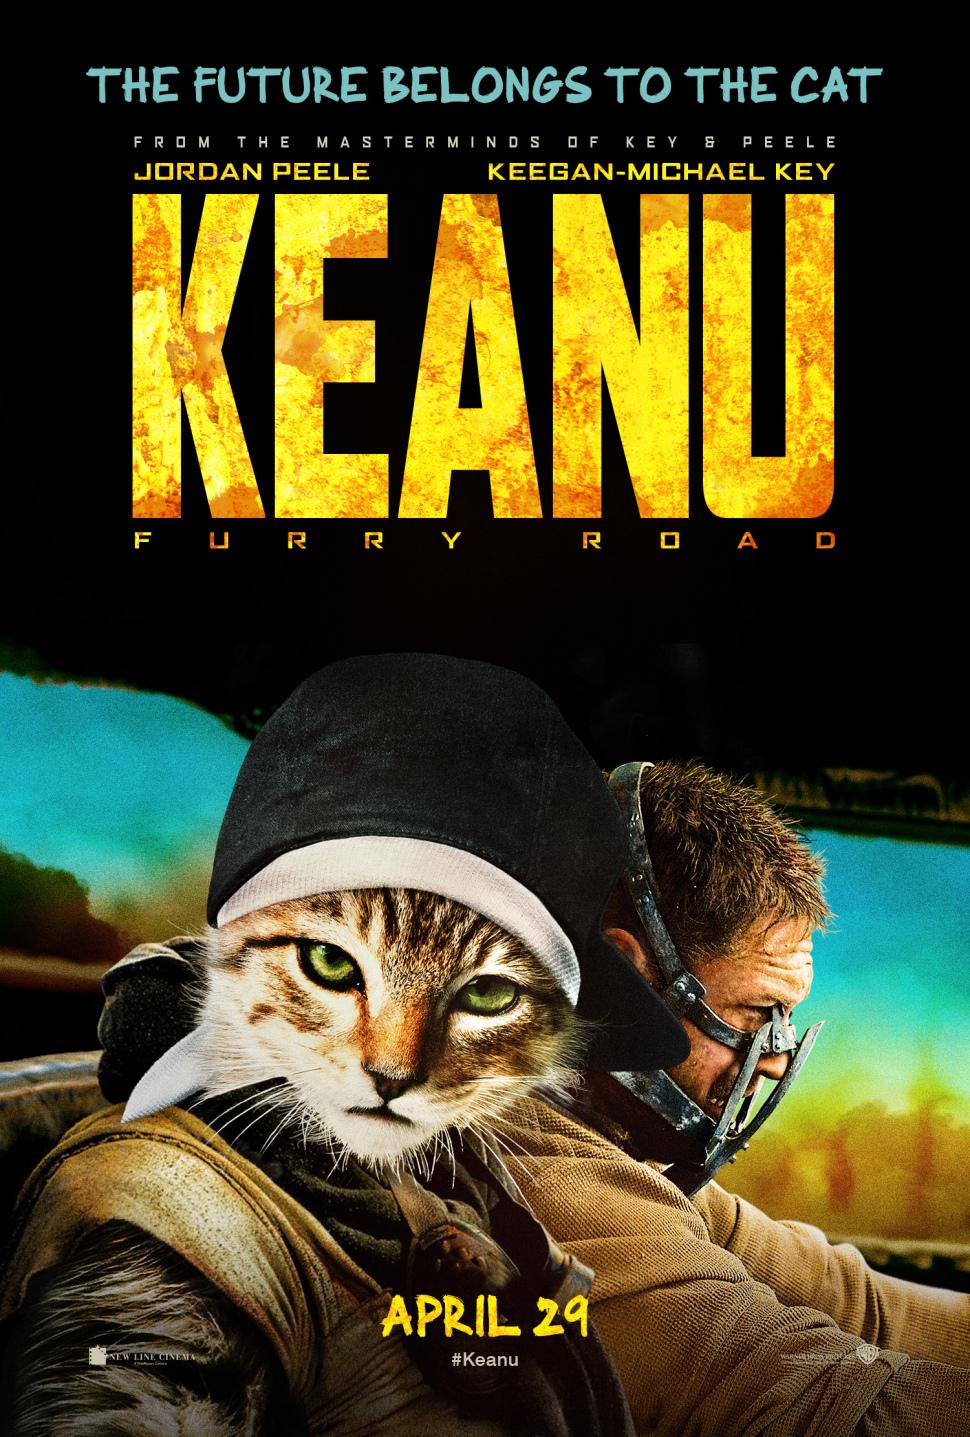 keanu_oscars_mad_max_master.jpg